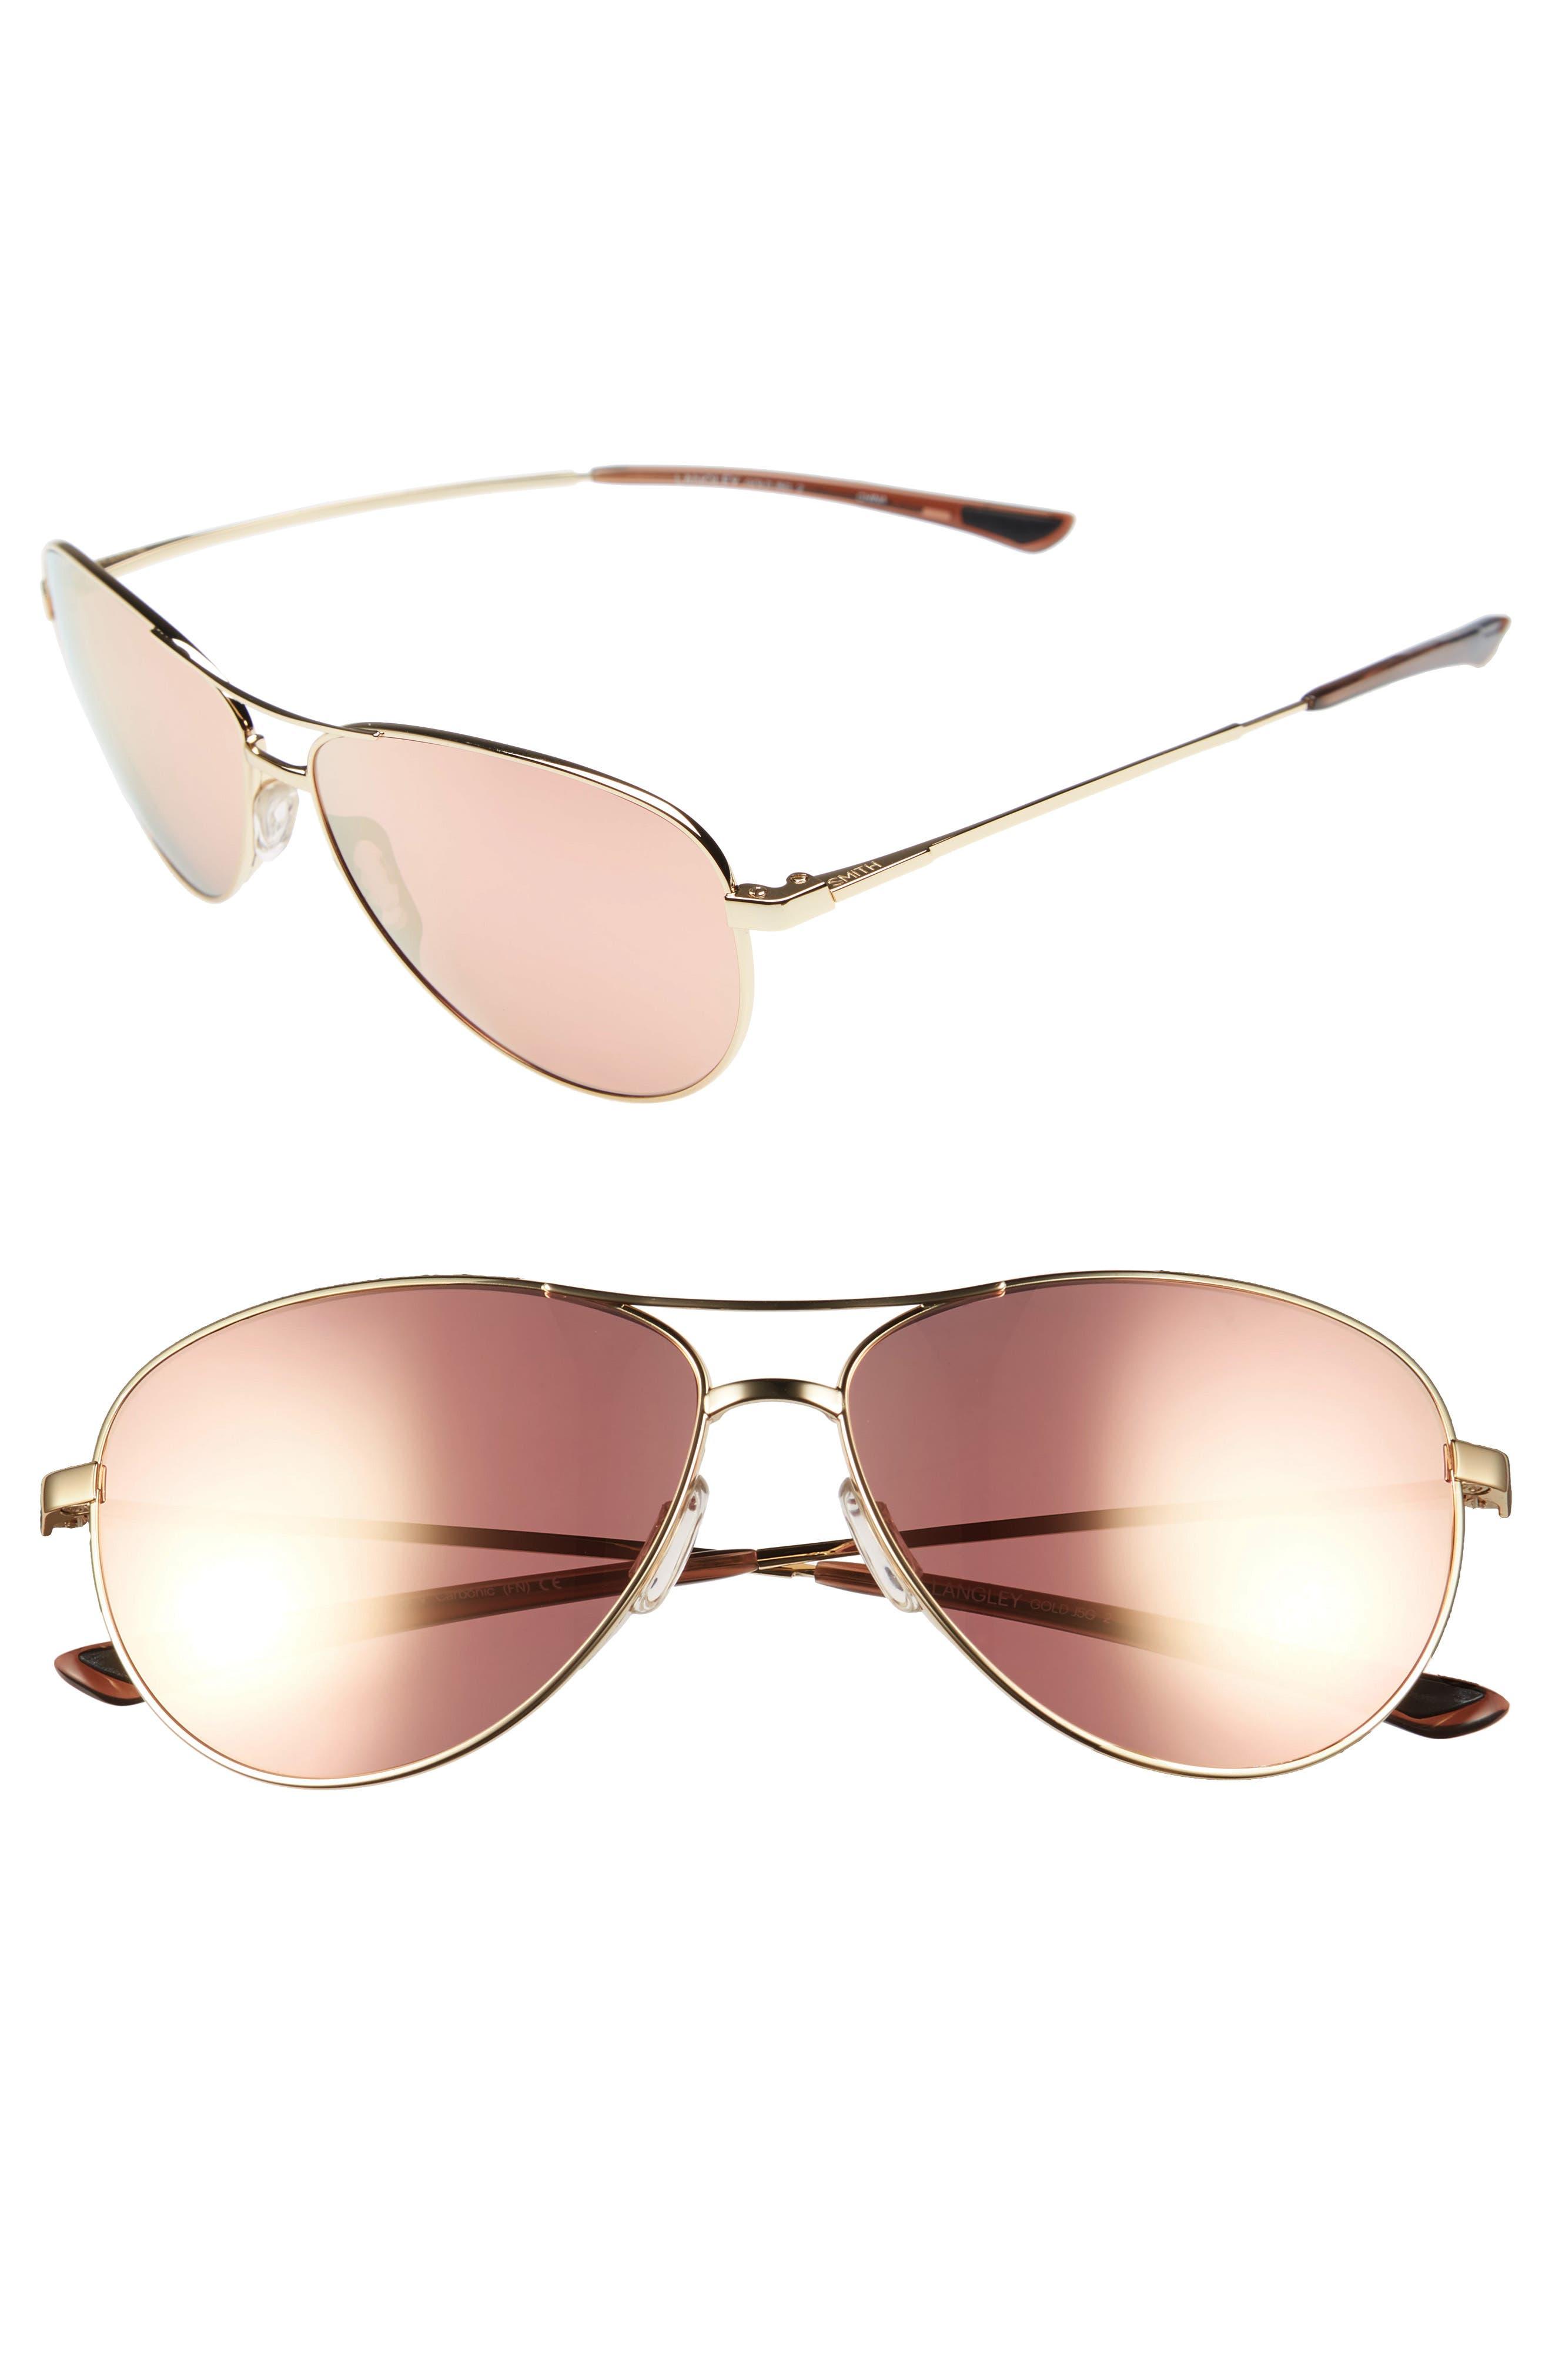 SMITH,                             'Langley' 60mm Aviator Sunglasses,                             Main thumbnail 1, color,                             GOLD